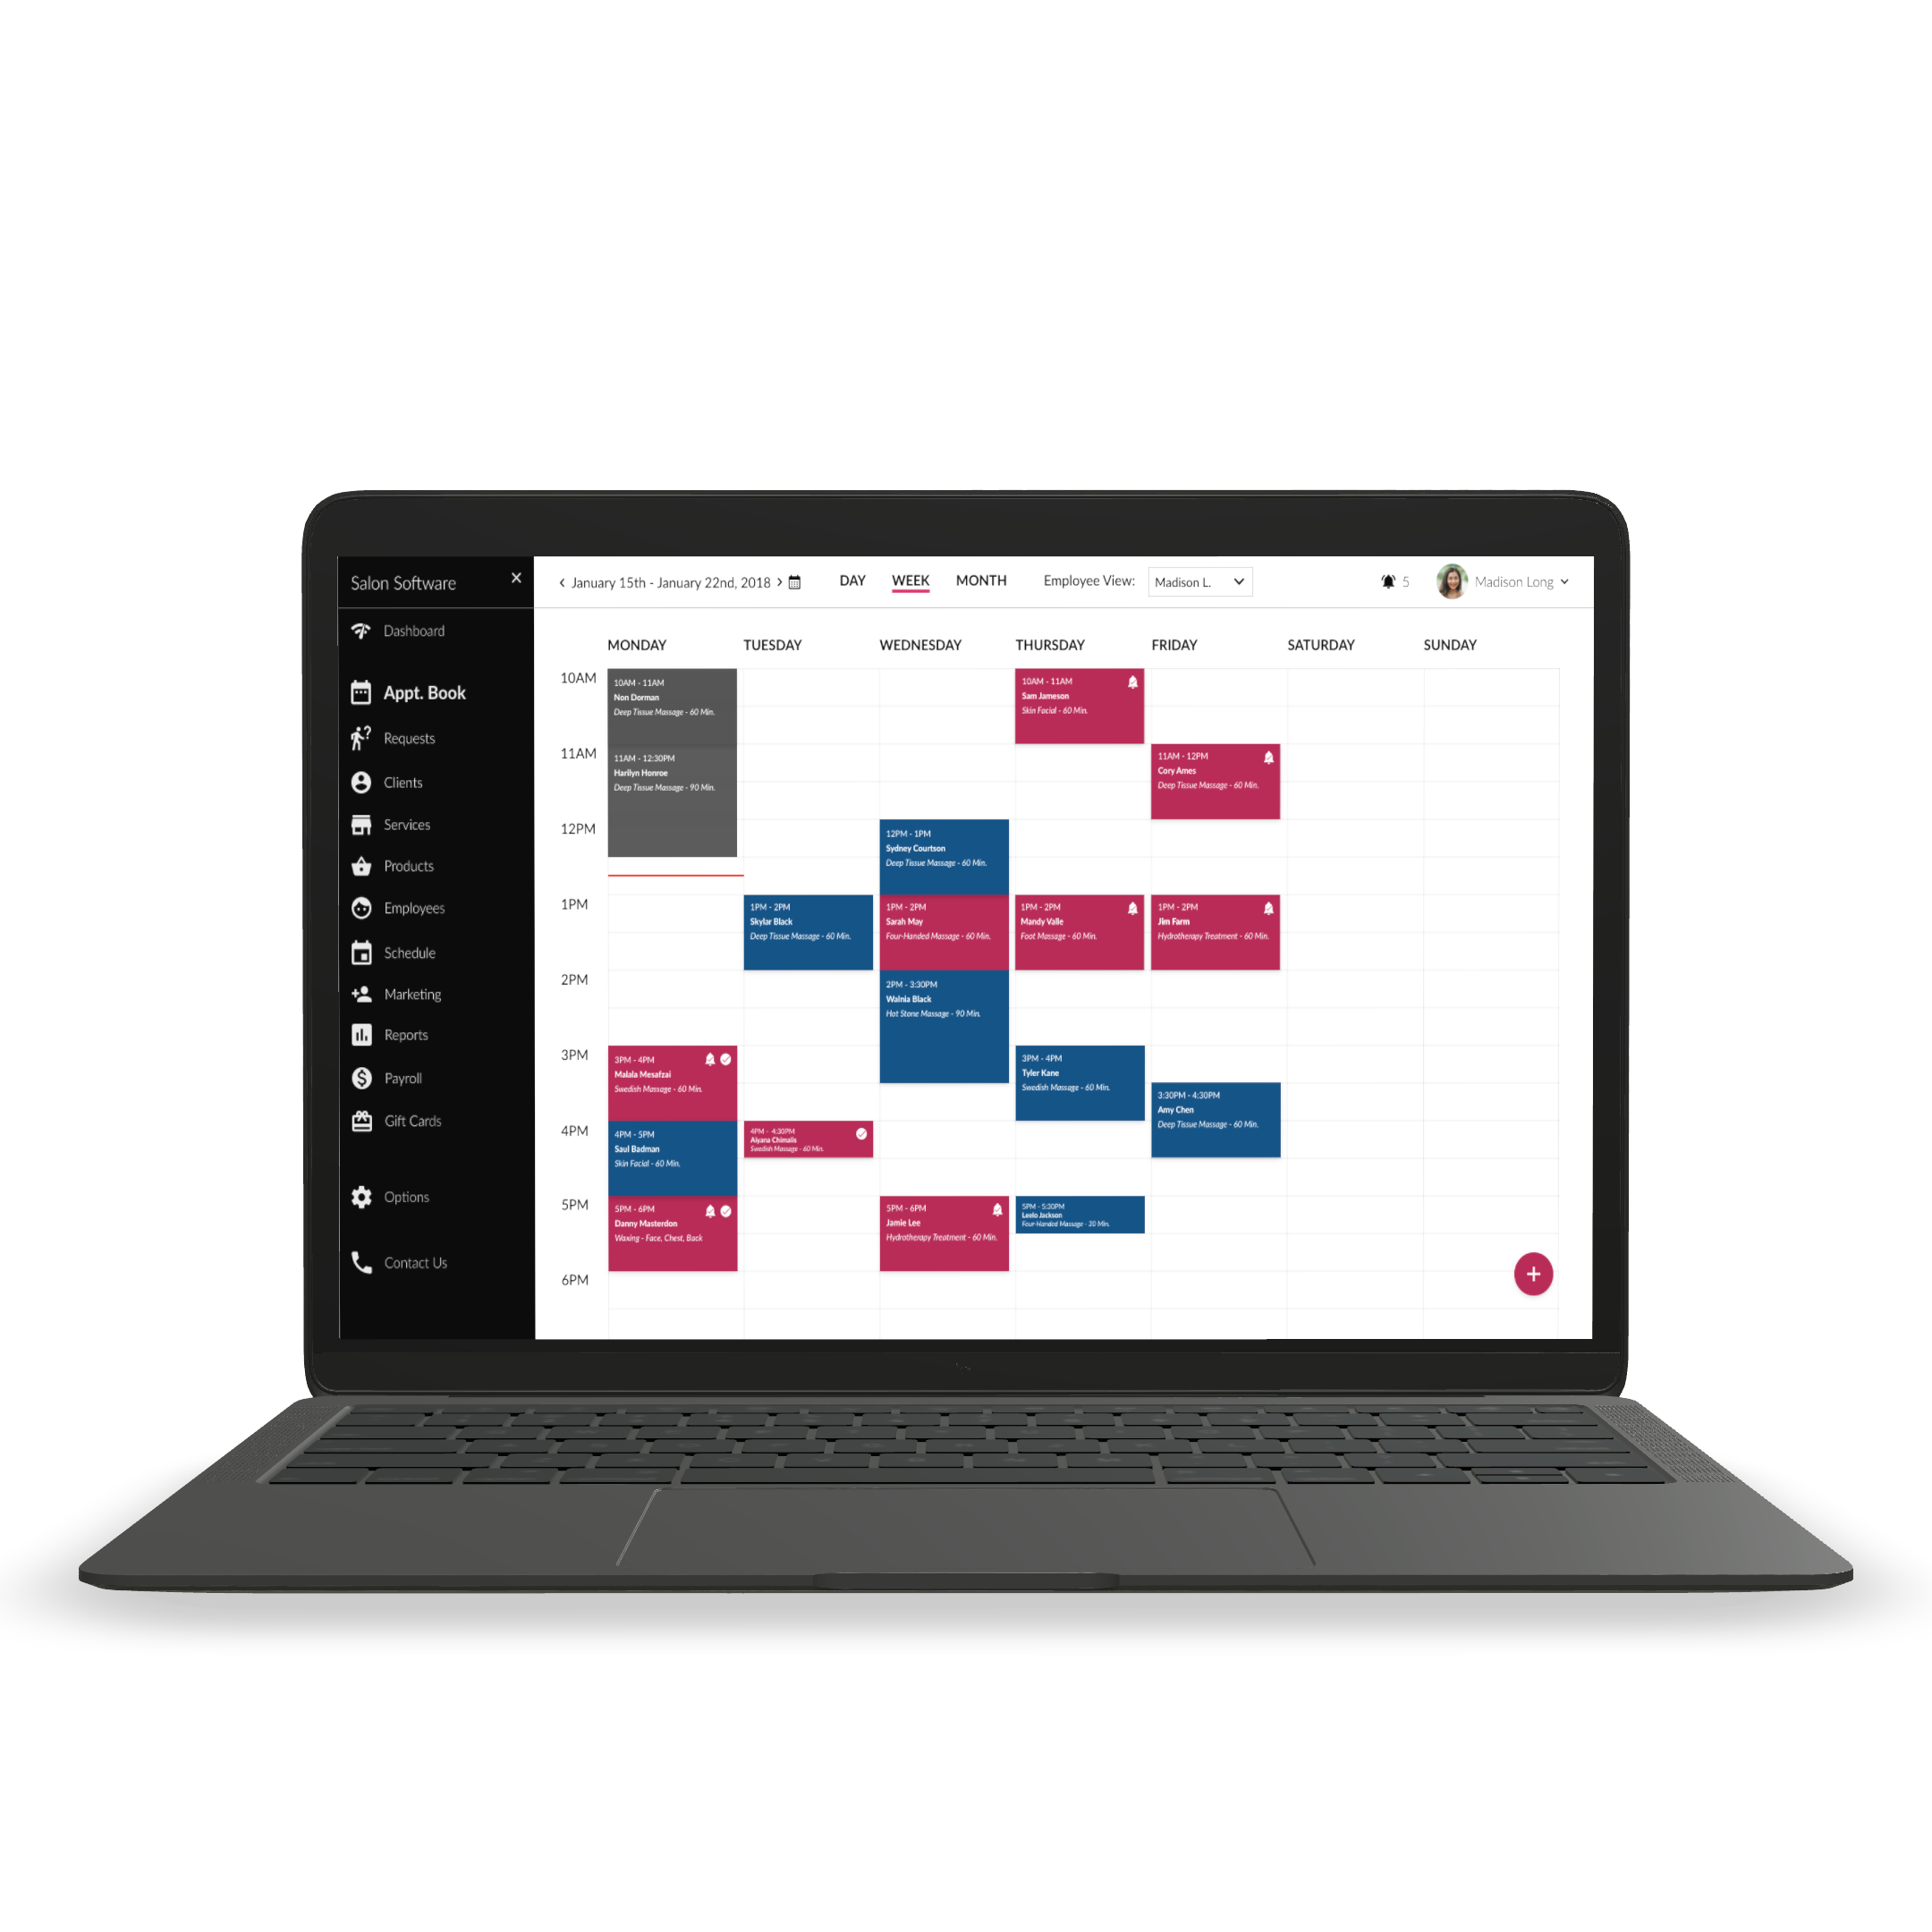 Salon Software Revitalized 💈 - DaySmart SoftwareLearn More